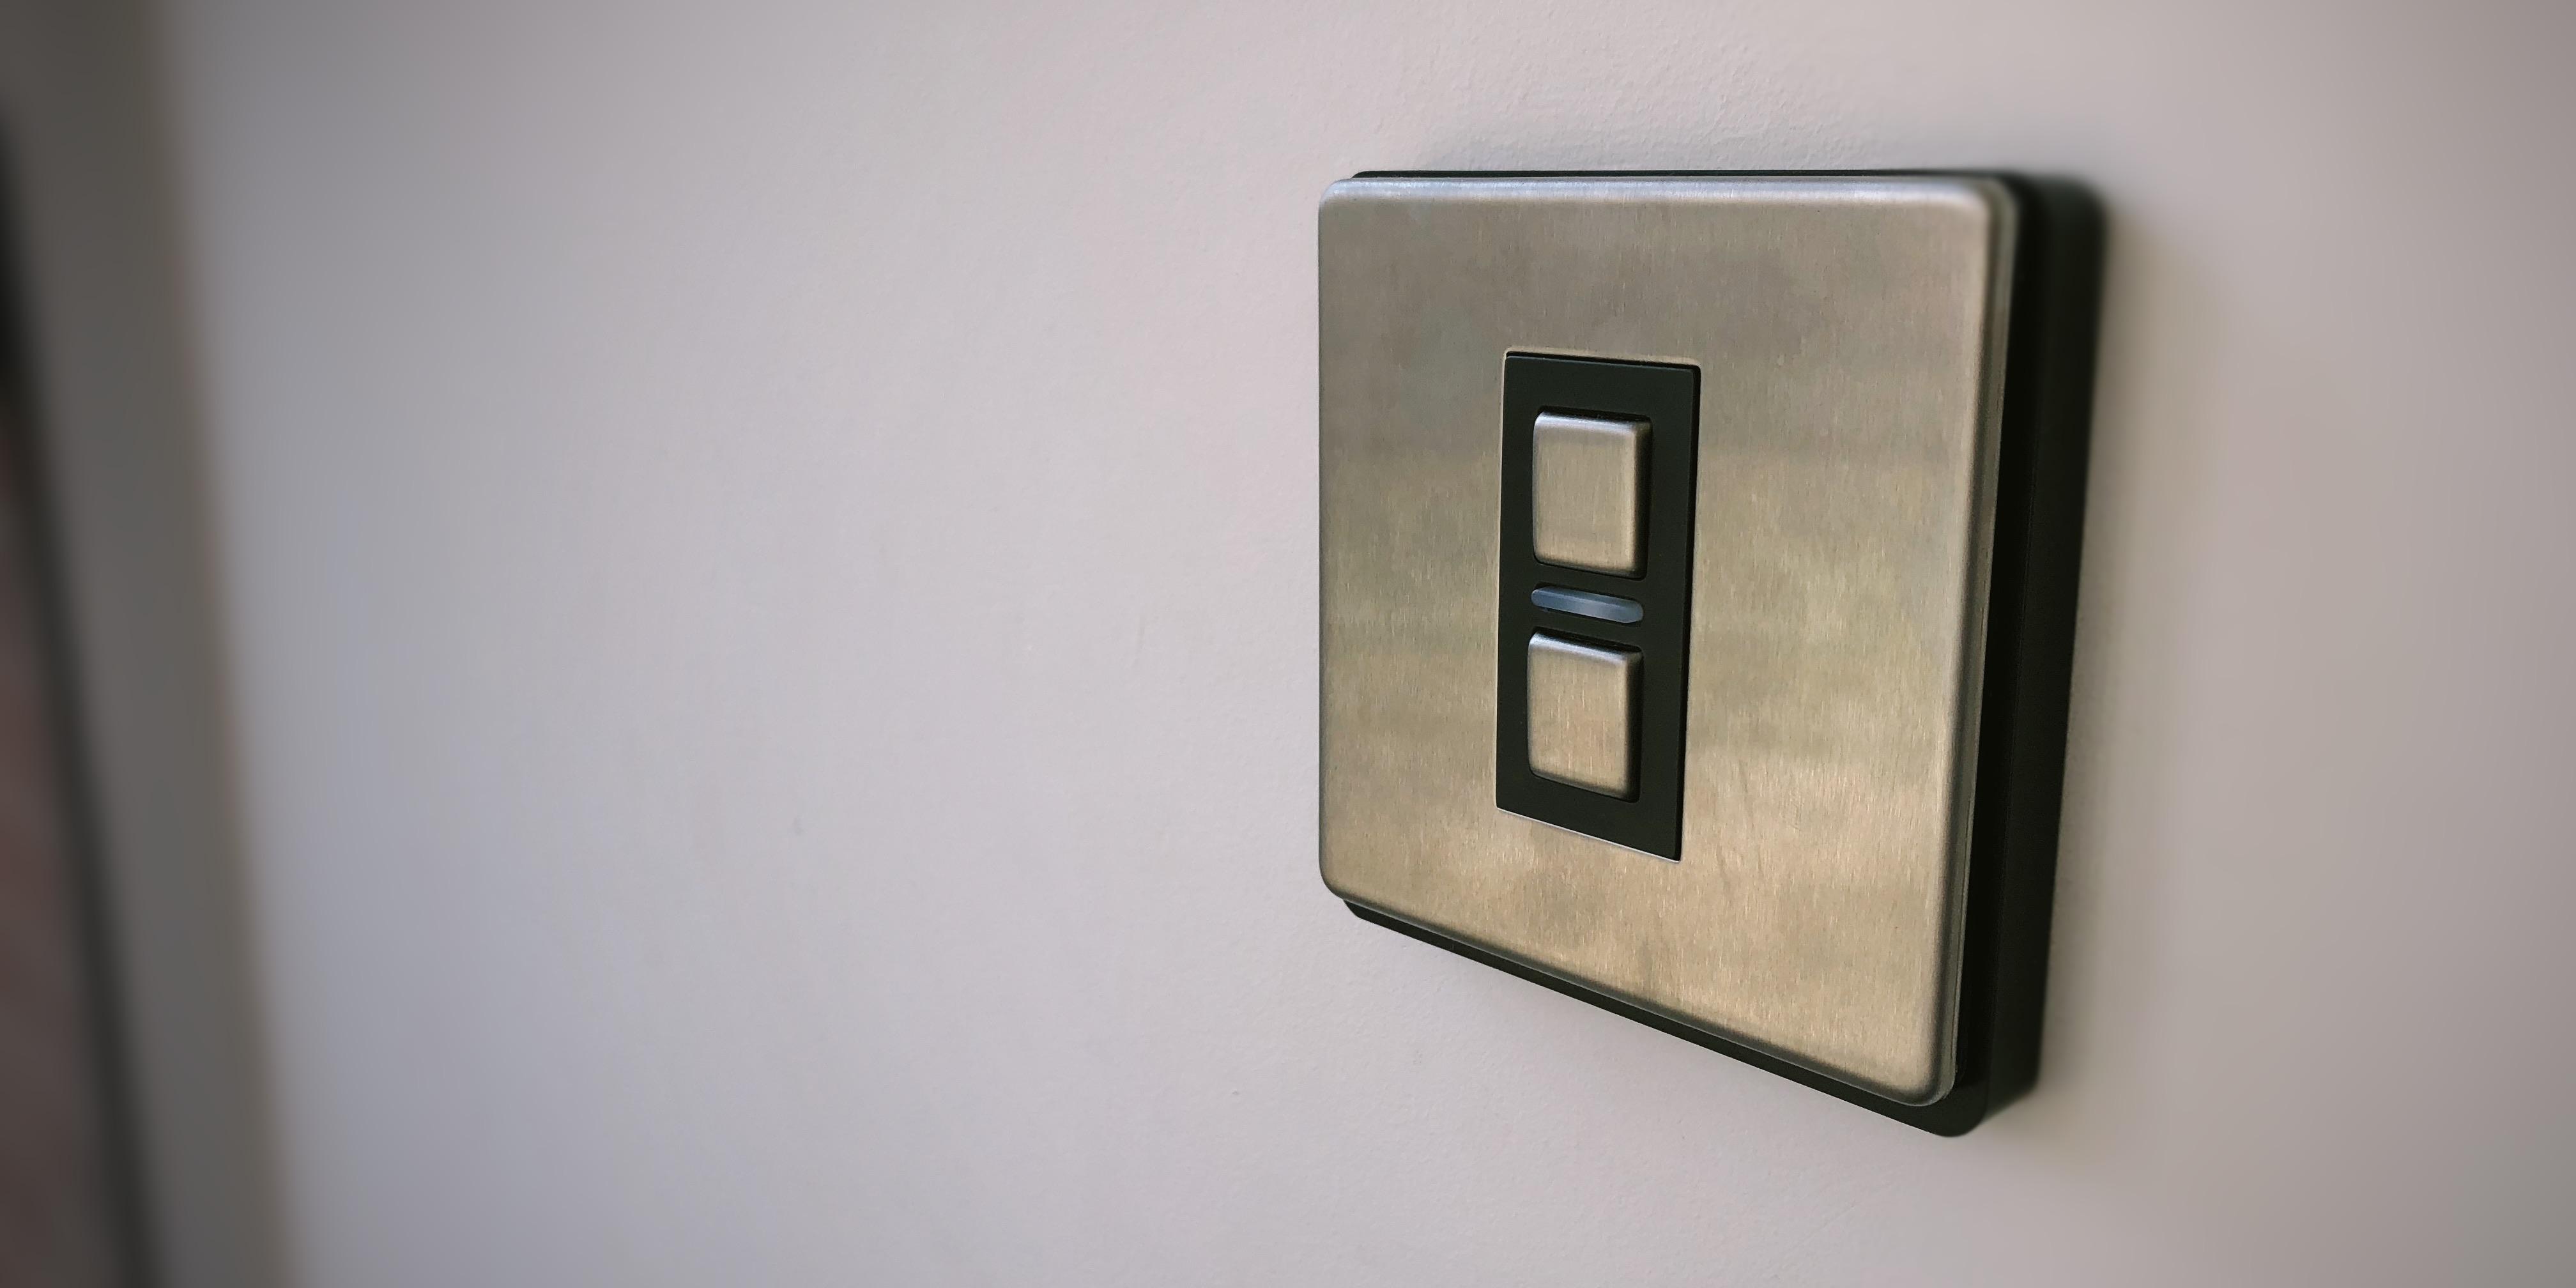 Review Lightwave Light Switch The Best Uk Homekit Solution For Smart Lighting 9to5mac